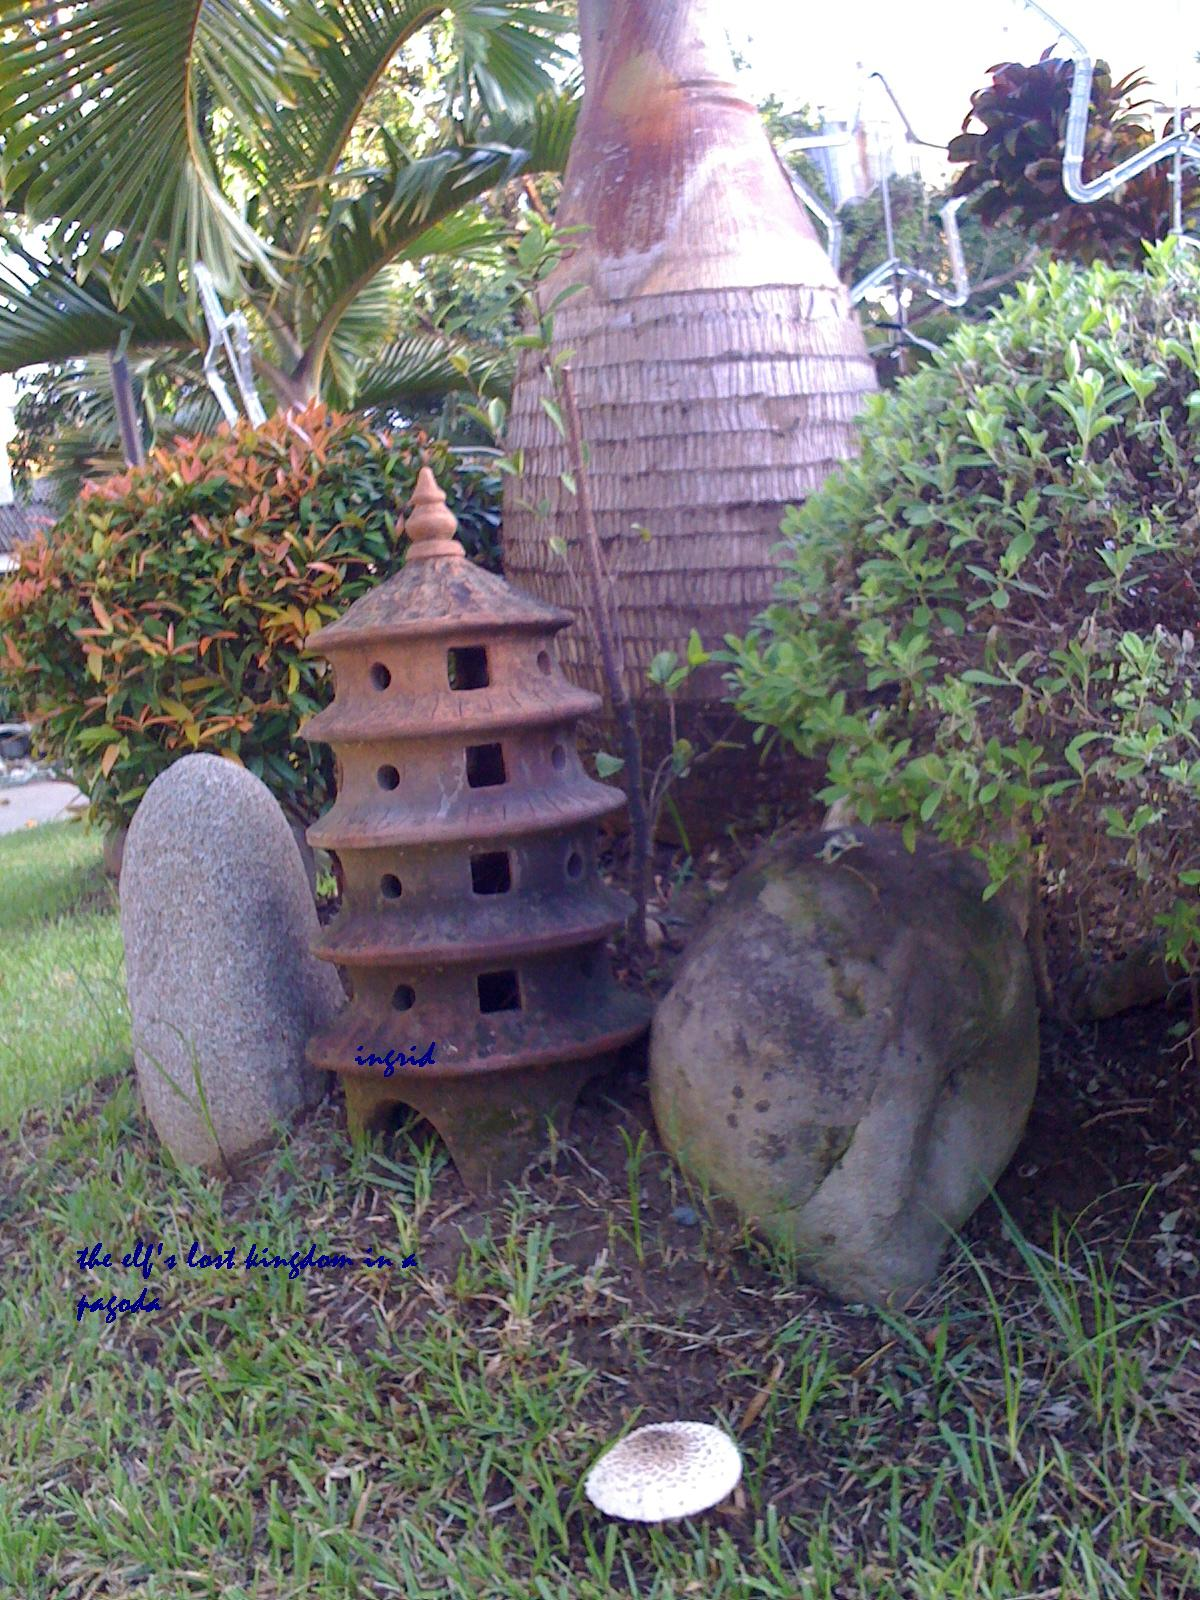 a miniature pagoda at the church.